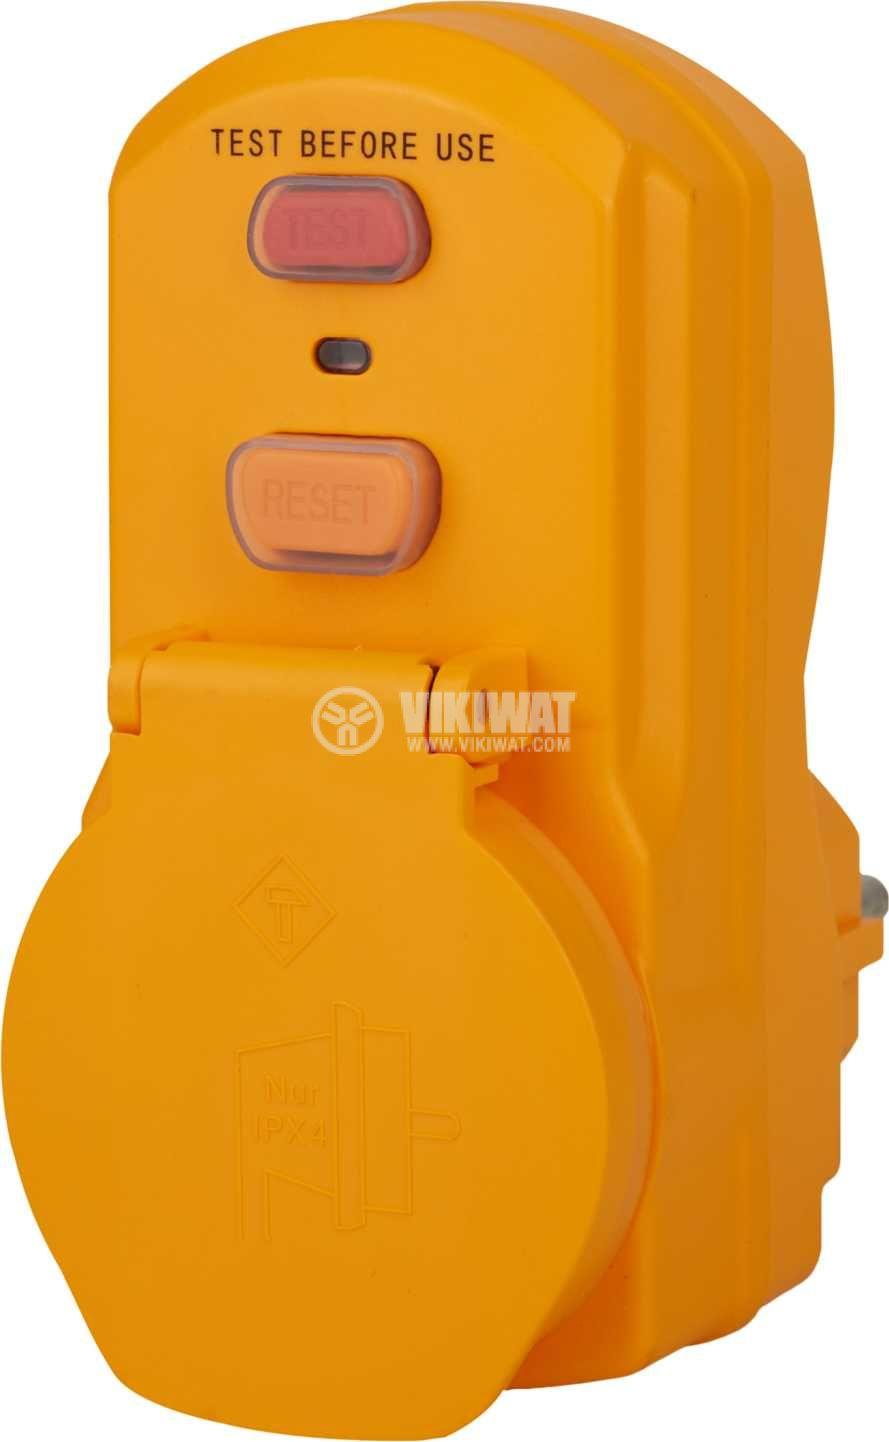 Адаптер - дефектнотокова защита, brennenstuhl, 16A, IP54, 1290660 - 1